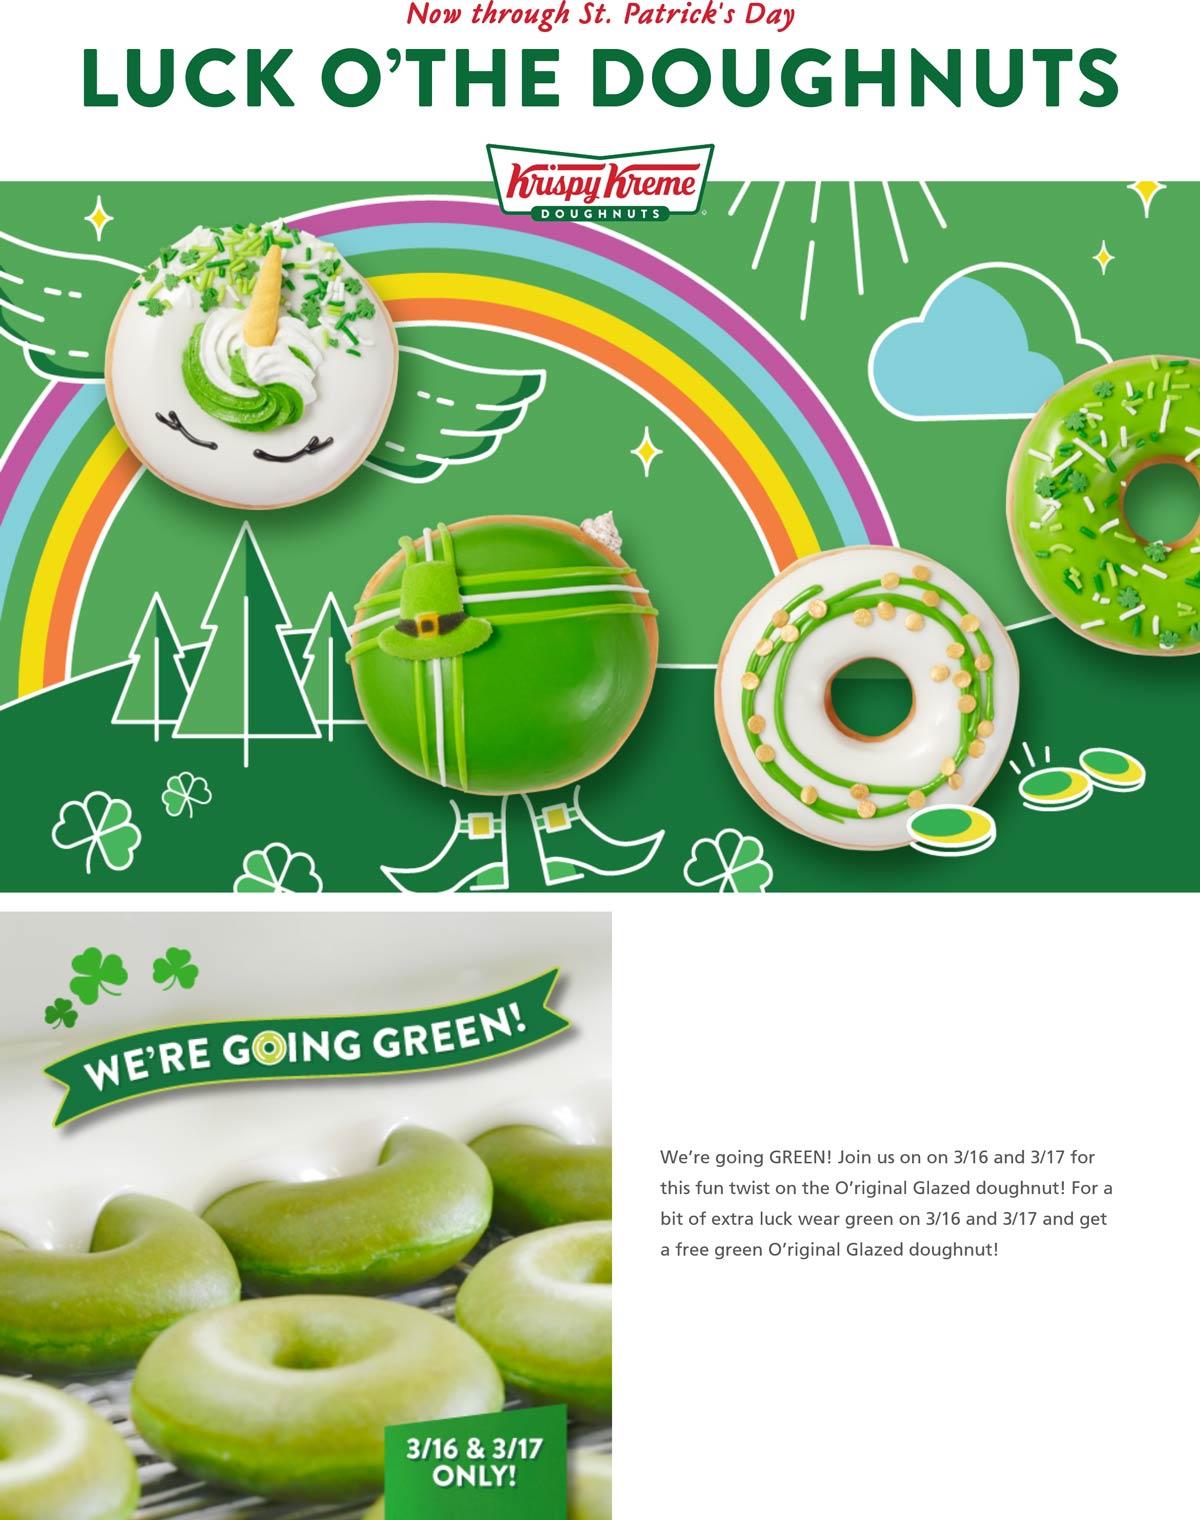 Krispy Kreme restaurants Coupon  Wear green for a free doughnut Tues & Weds at Krispy Kreme #krispykreme